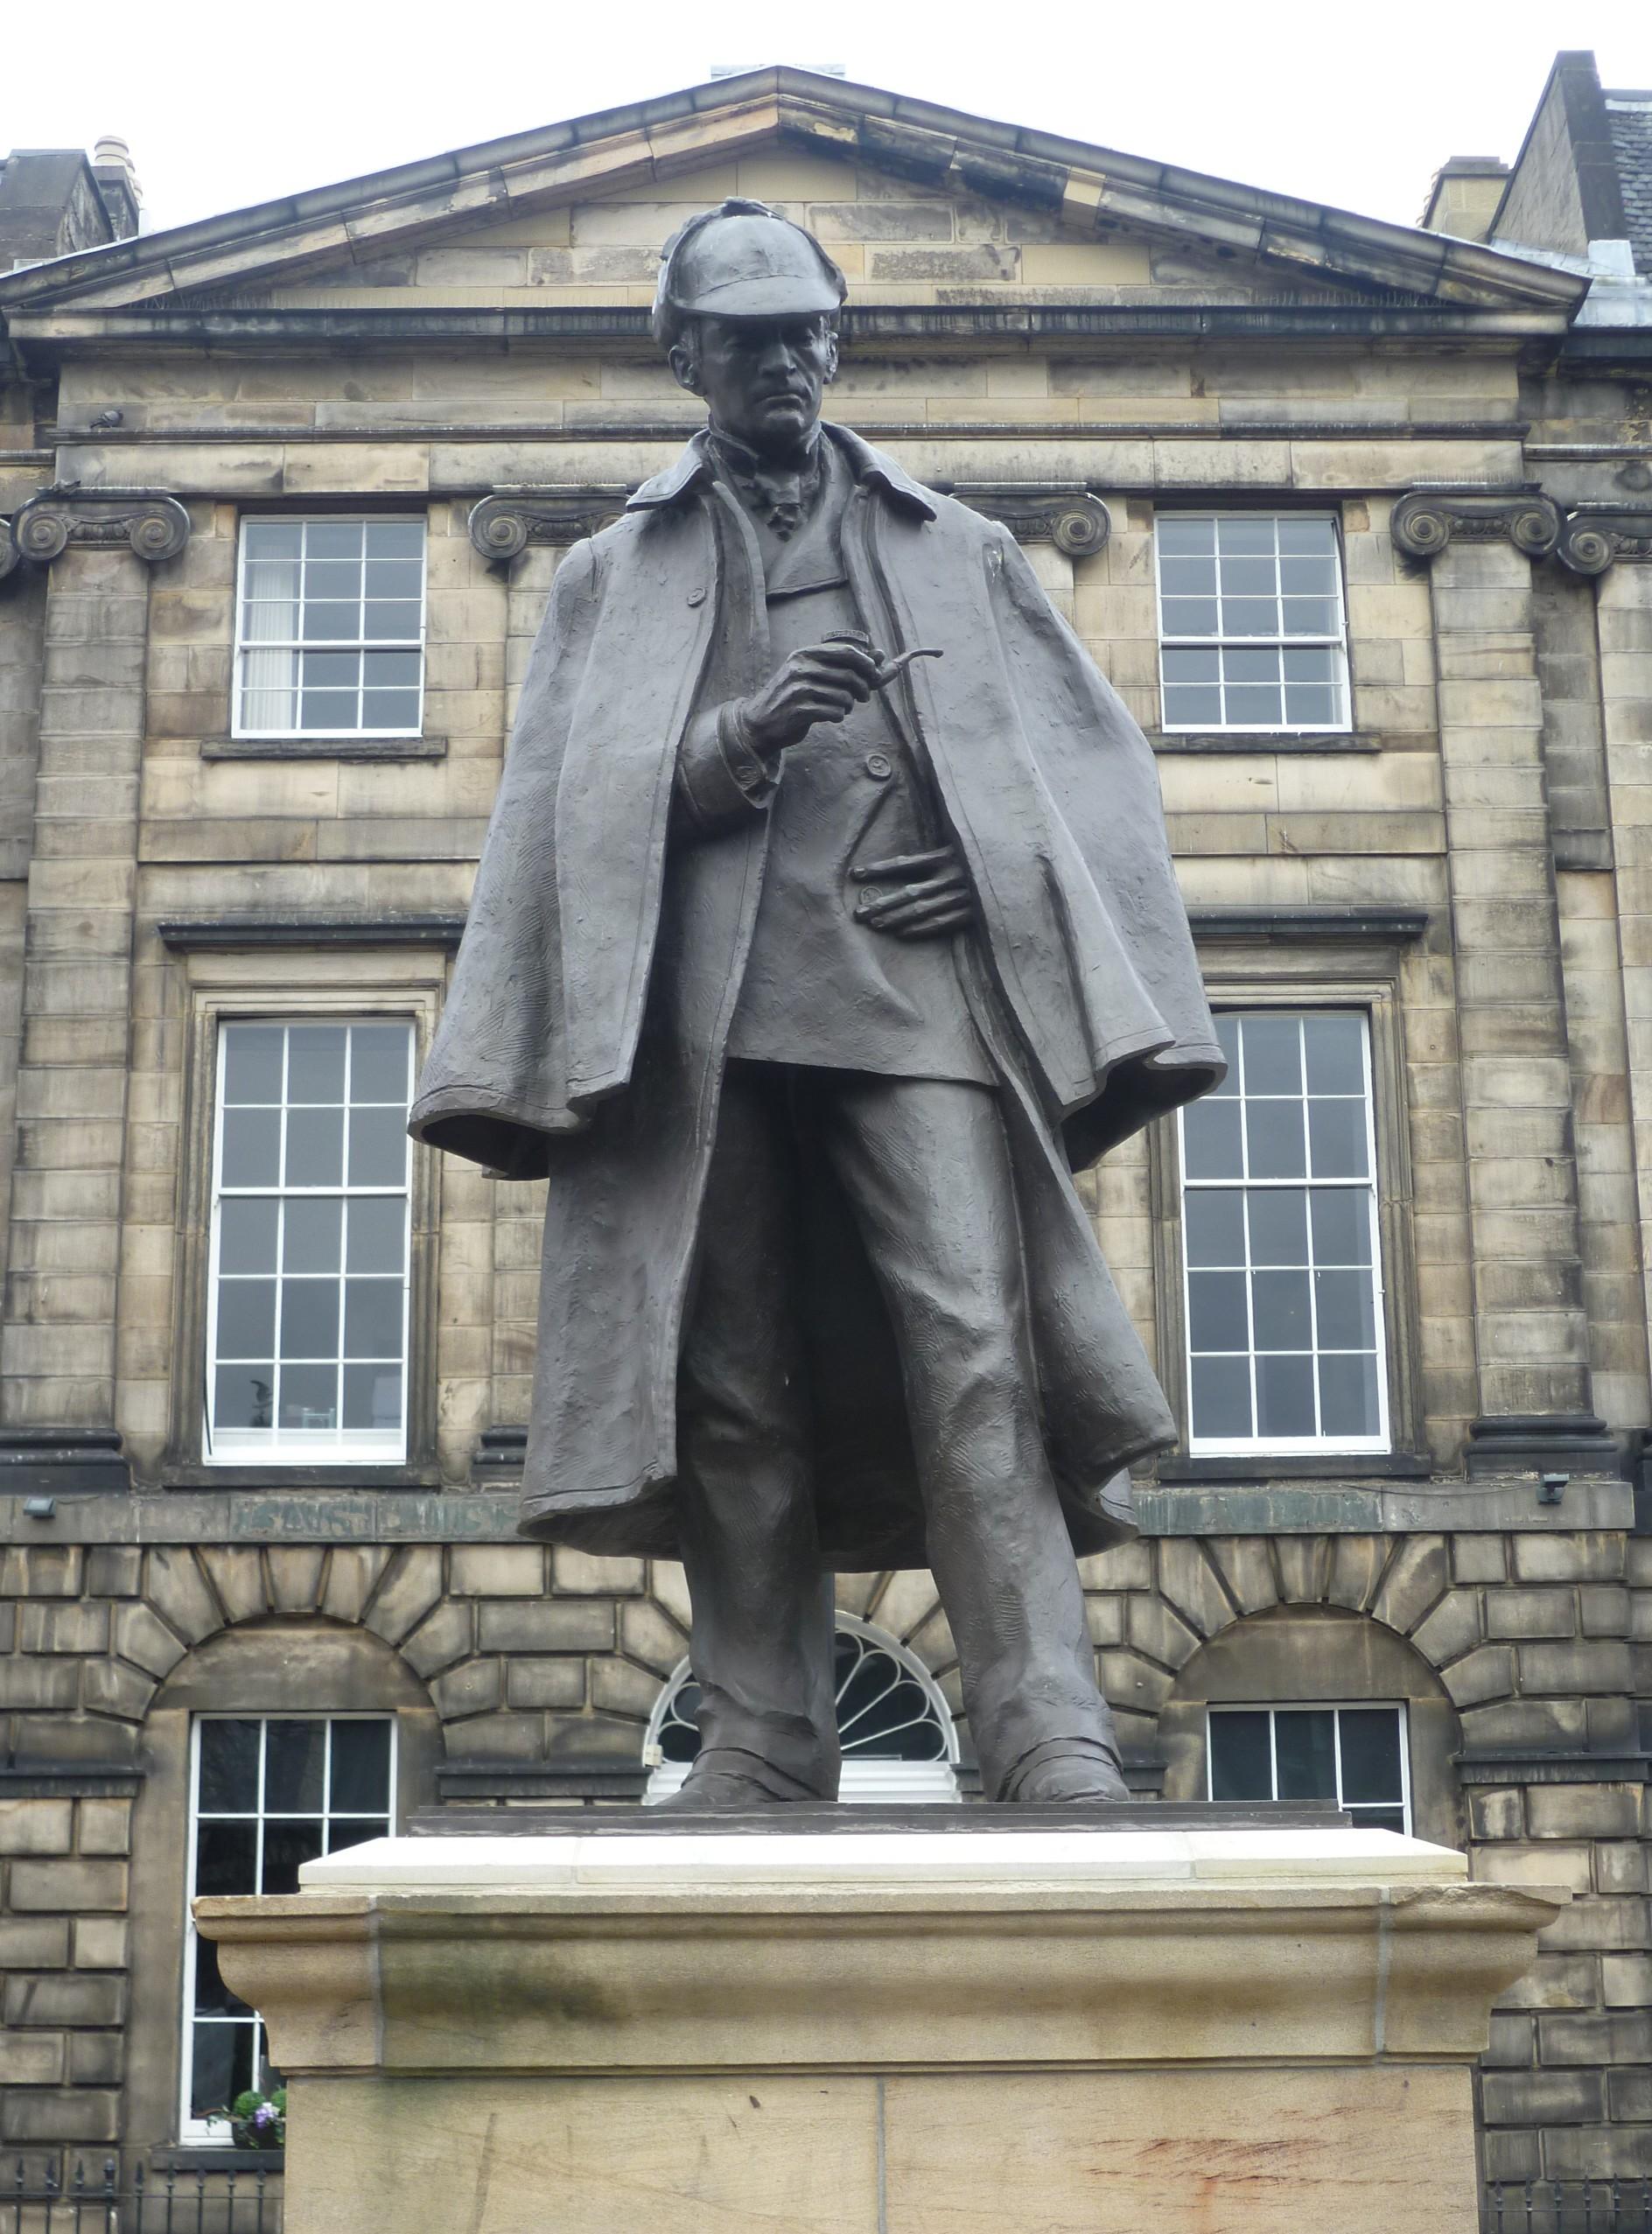 Sherlock_Holmes_Statue,_Edinburgh.JPG